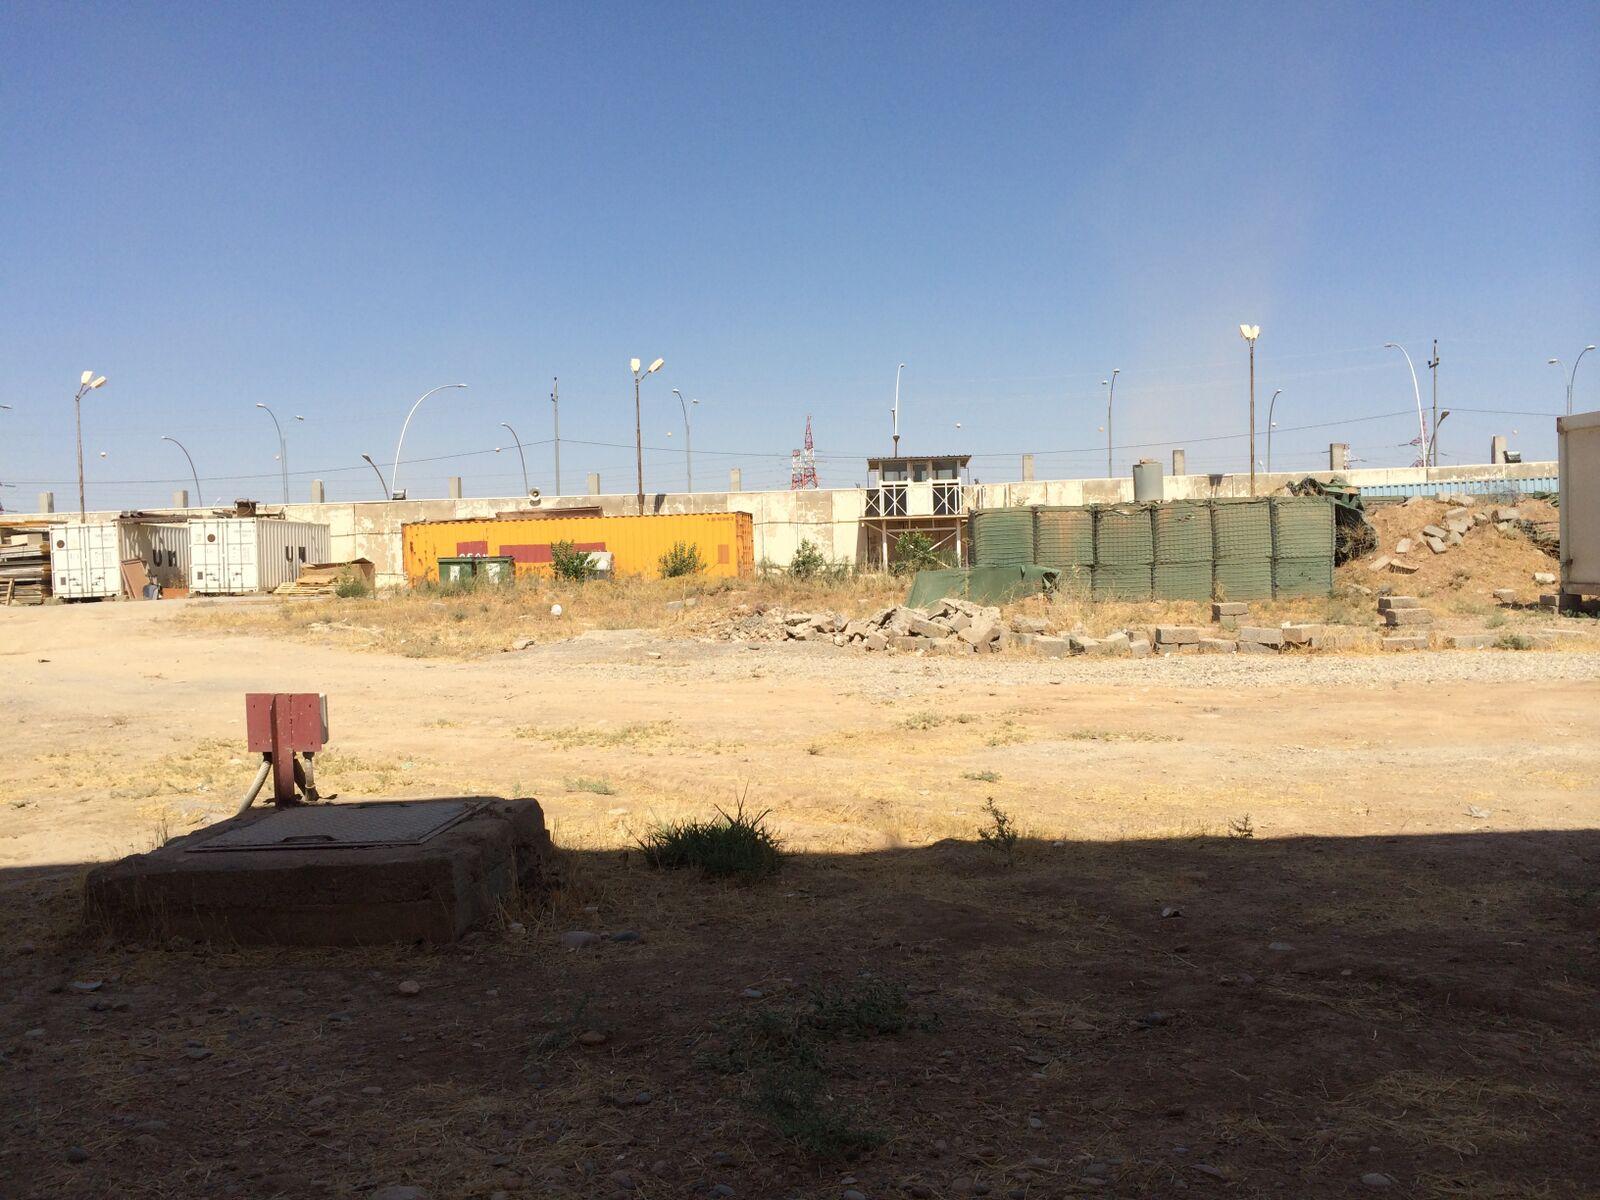 UNAMI Compound, Erbil, 2014. The only place where we could walk alone in Erbil. © Brendan McDonald